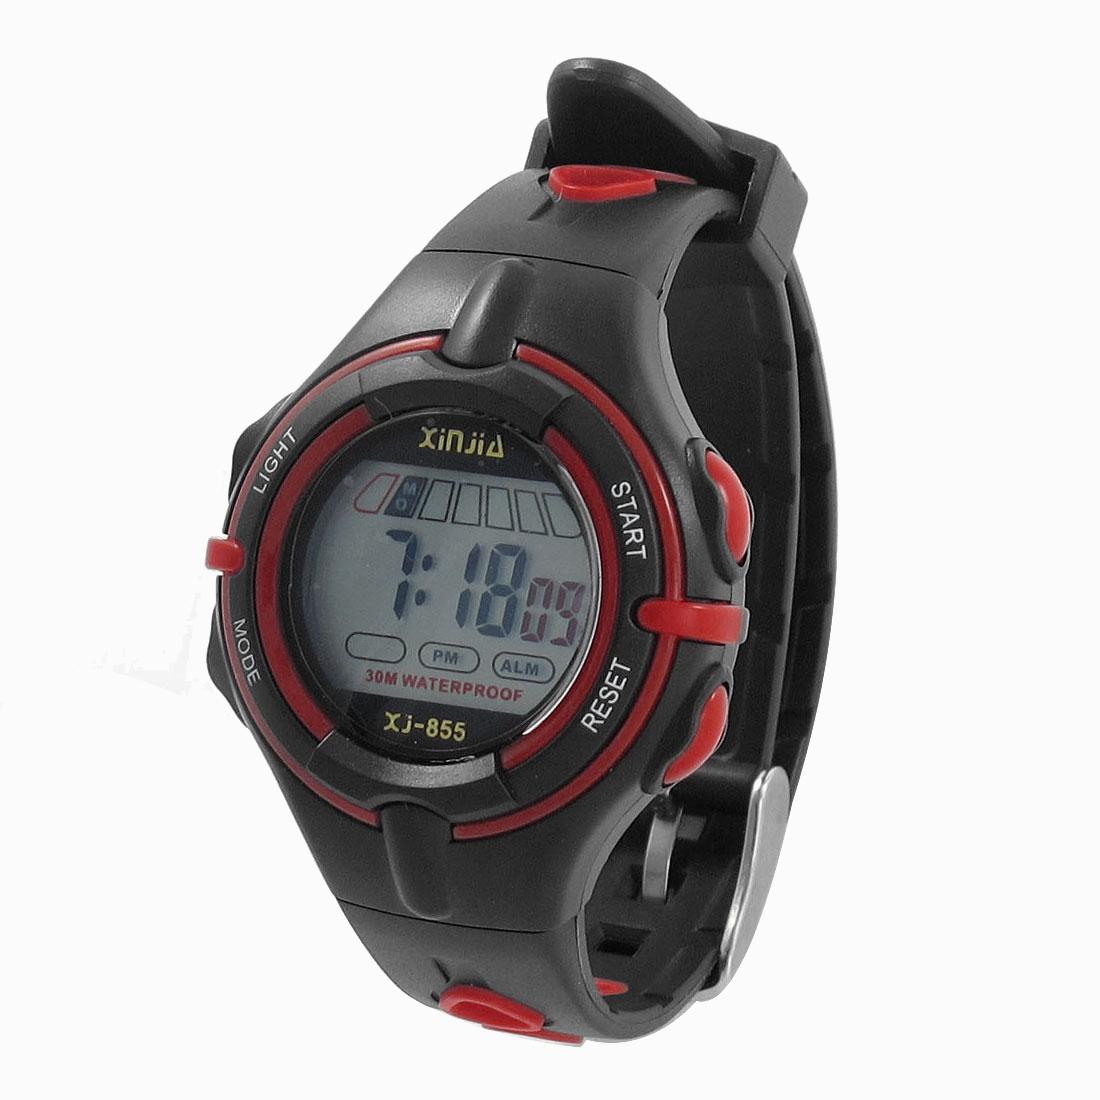 Adjustable Band Coldlight Stopwatch Alarm Clock Sports Wrist Watch Black Red